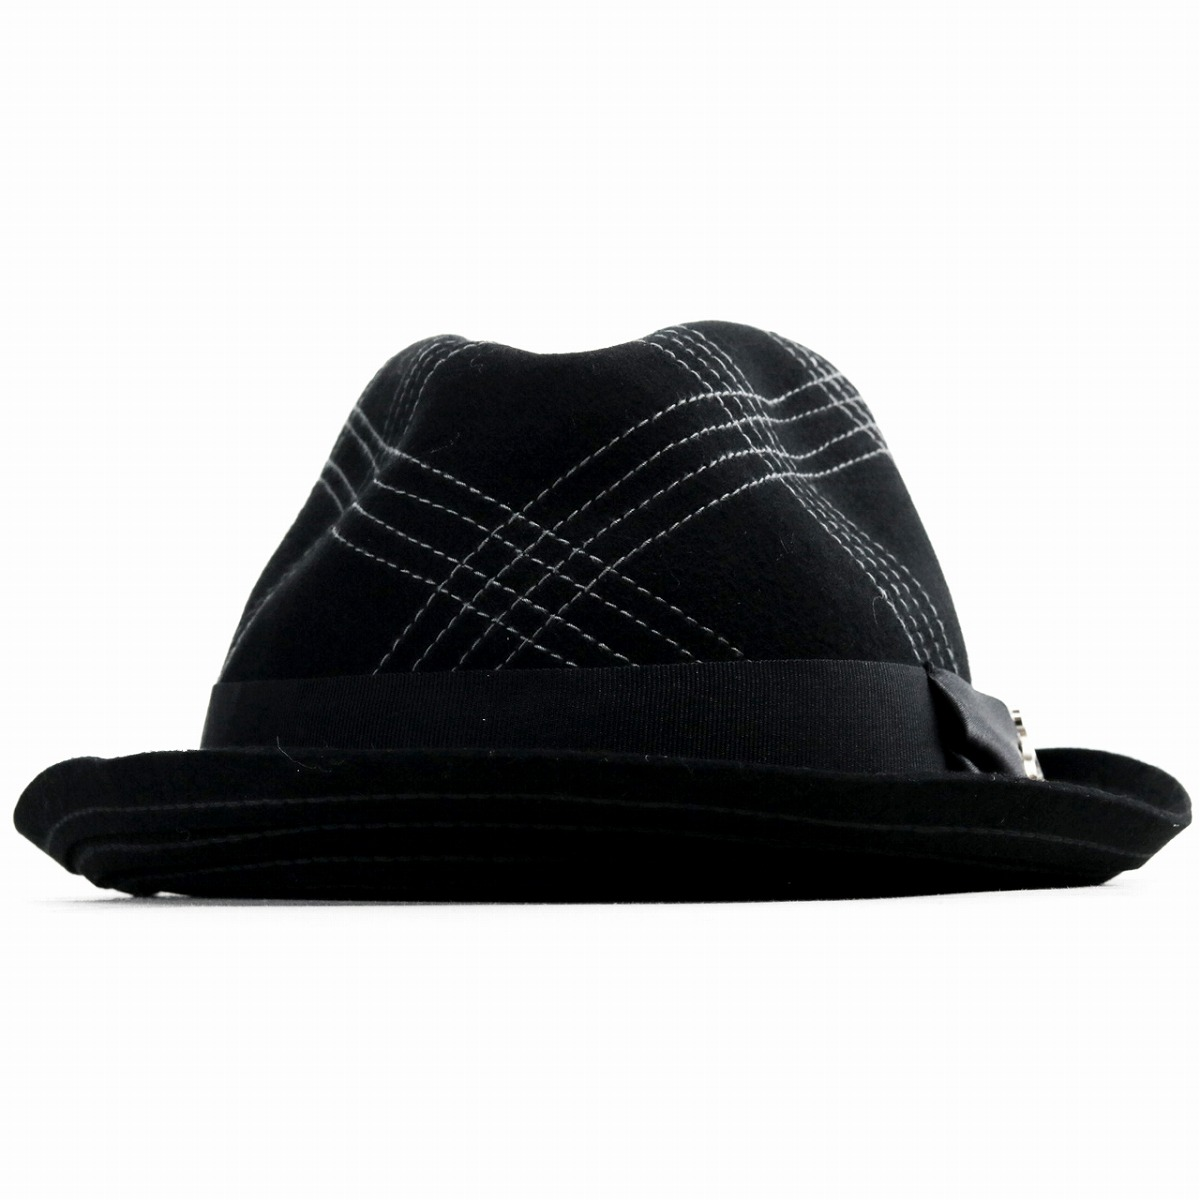 73a6864f116 Carlos Santana men hat hat wool hat CARLOS SANTANA felt hat check soft   Straw ...